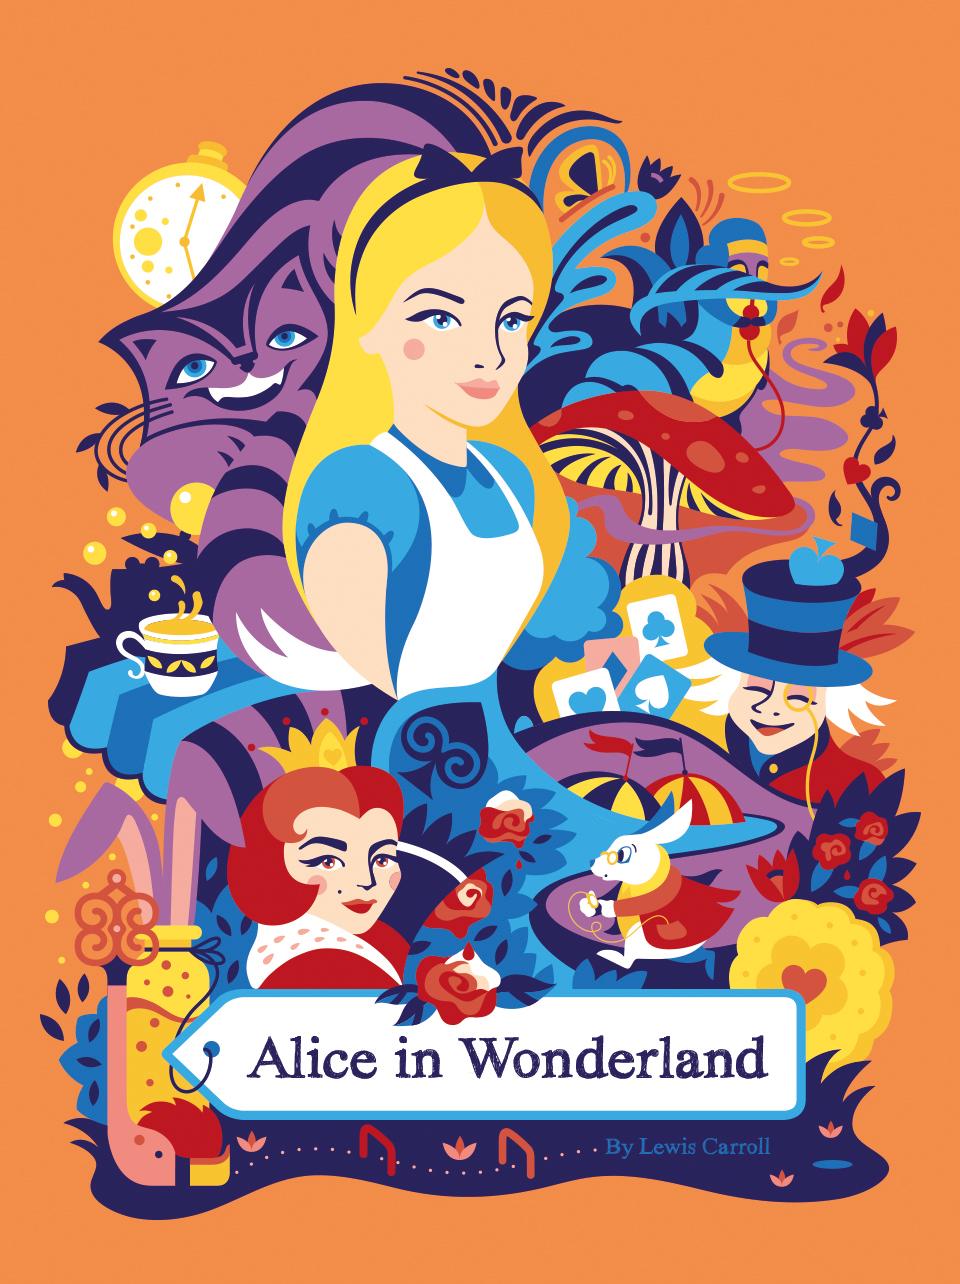 alice in wonderland banned books 10042015 alice's adventure in wonderland author: lewis carrol (charles dodgson) information positive & negative criticism positive: imaginative book.